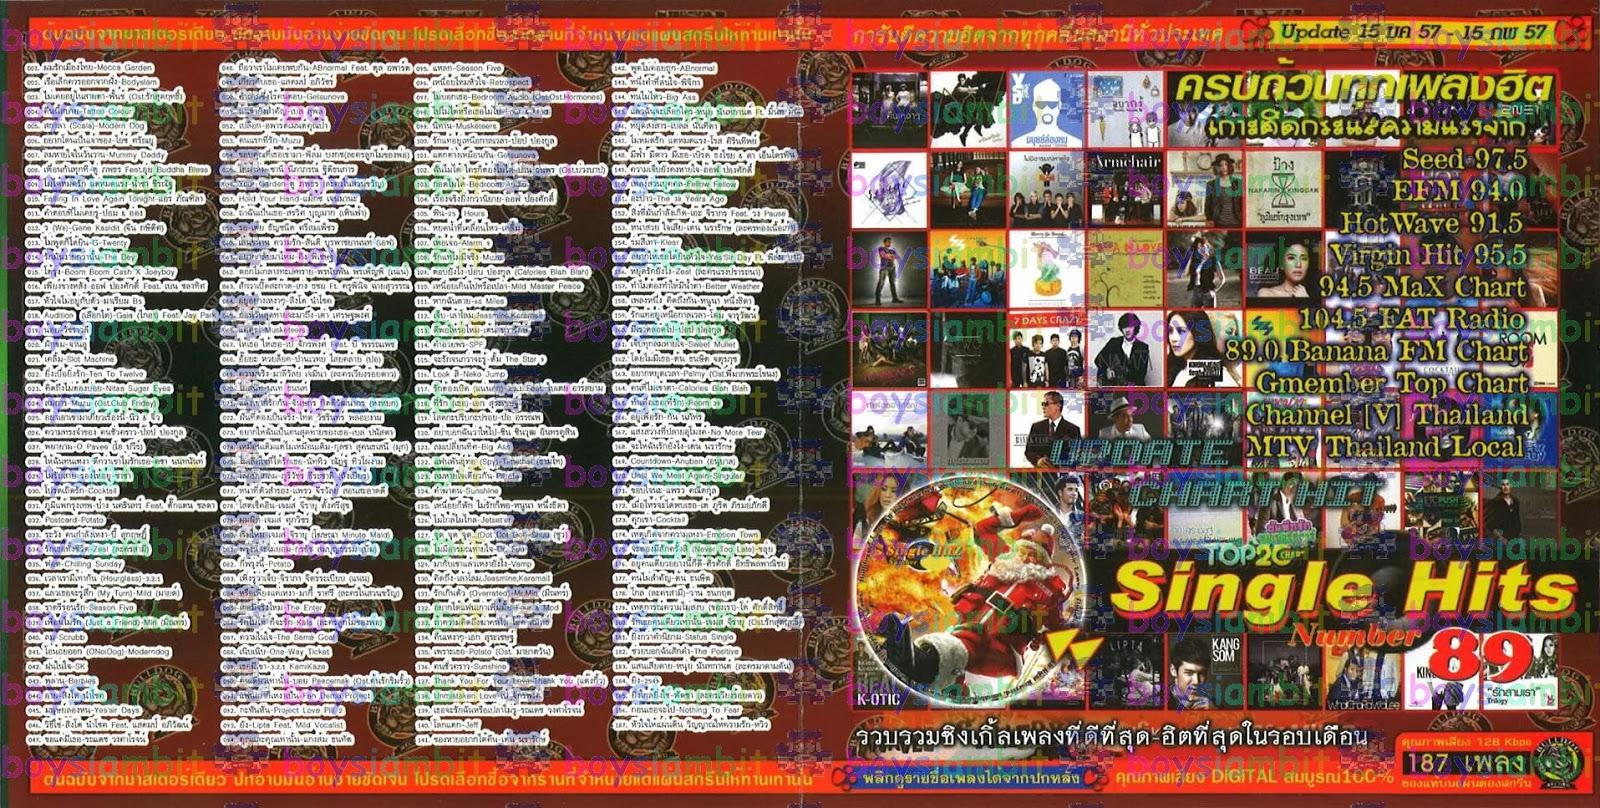 Download [Mp3]-ใหม่ รวมซิงเกิ้ลเพลงไทยที่ดีที่สุด ฮิตที่สุดในรอบเดือน [Hot New] Single Hits Number 89 อัพเดท 15 มกราคม 2557 ถึง 15 กุมภาพันธ์ 2557 [Shared] 4shared By Pleng-mun.com